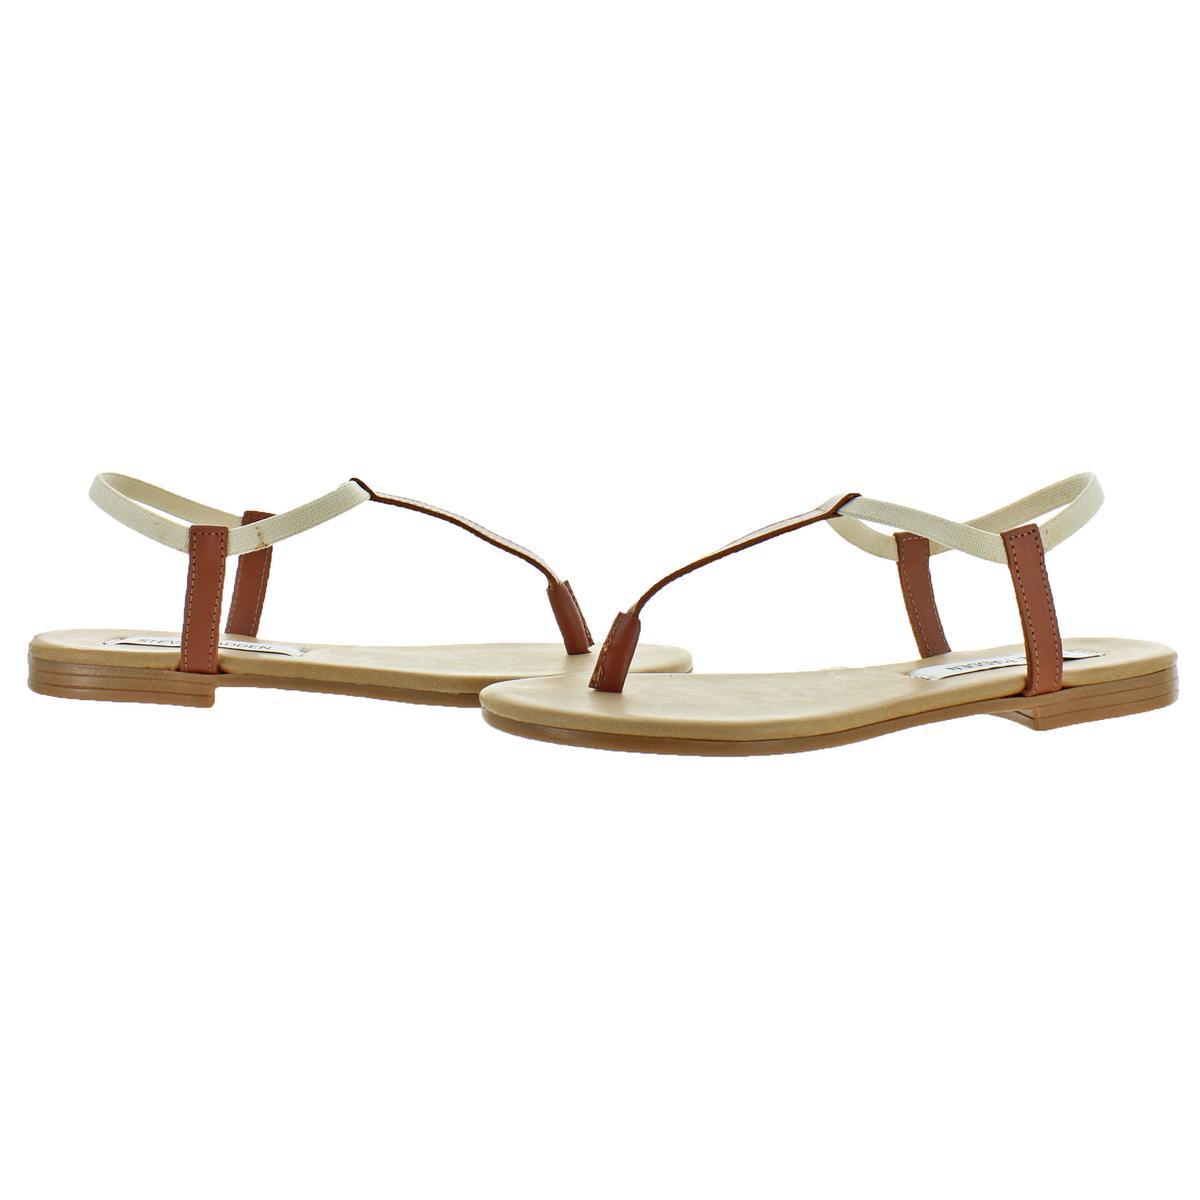 Steve-Madden-Women-039-s-Synergy-Leather-Thong-T-Strap-Sandals thumbnail 6